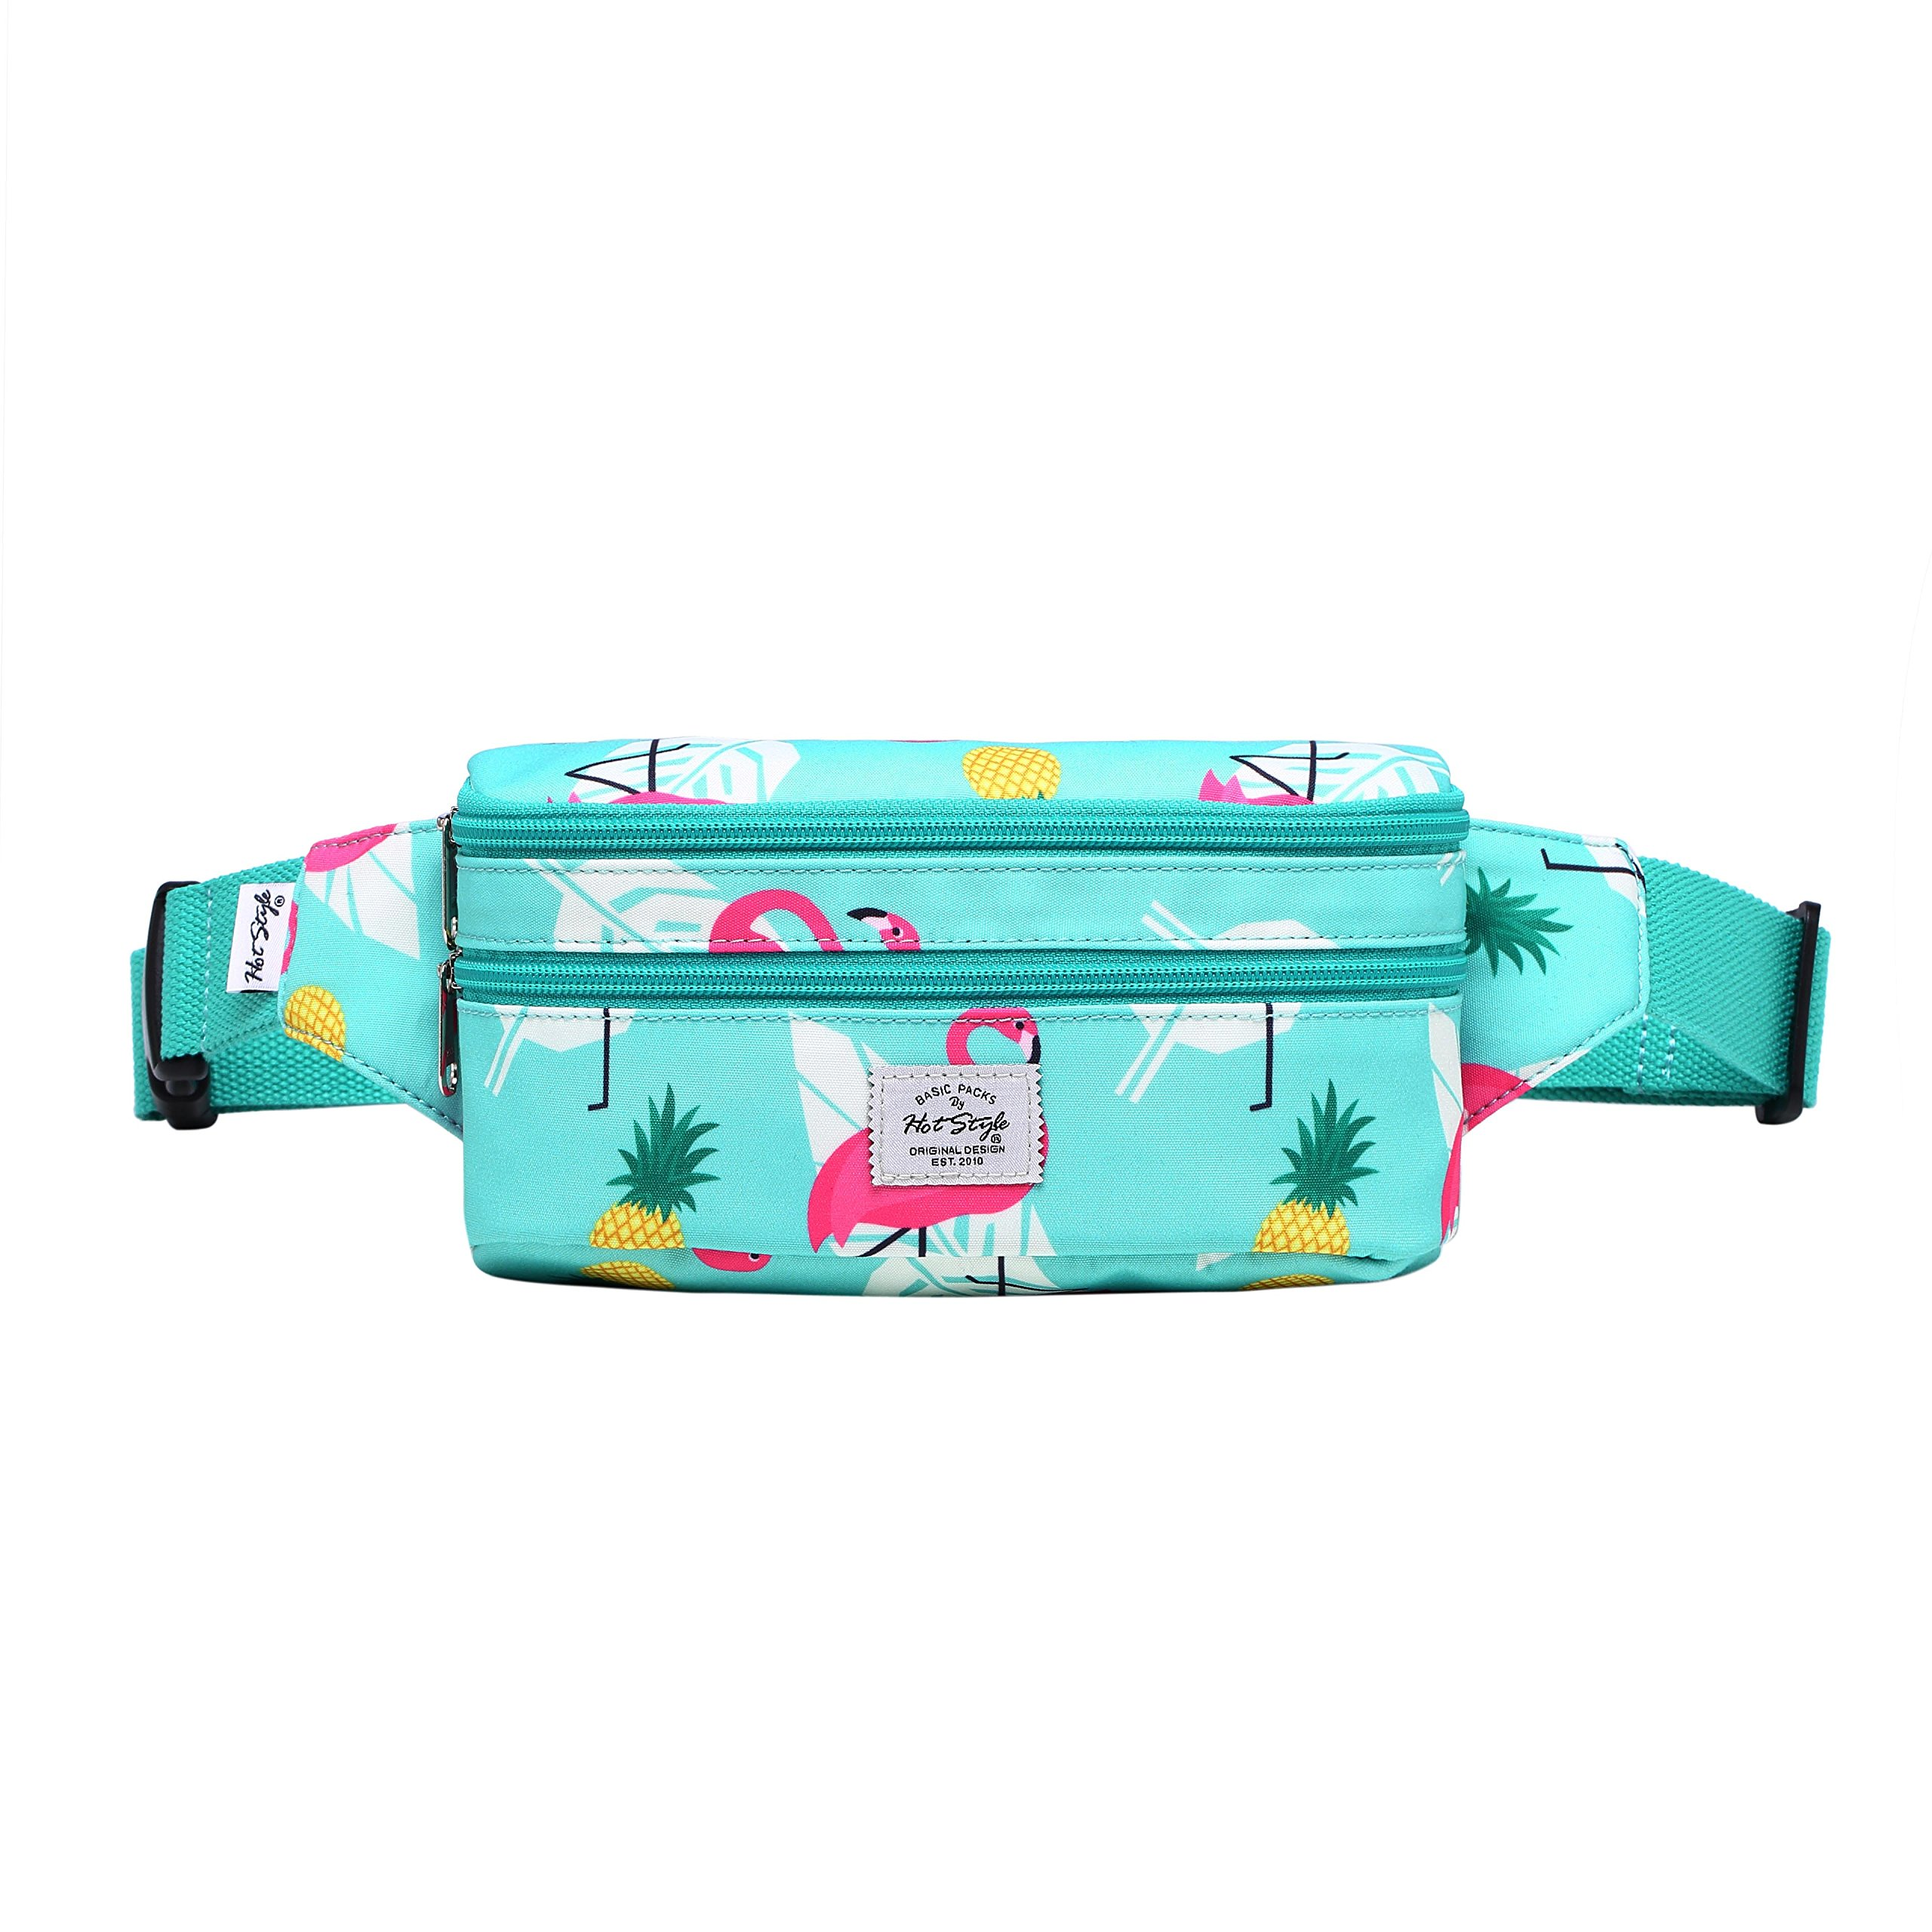 521s Fashion Waist Bag Cute Fanny Pack | 8.0''x2.5''x4.3'' | Flamingo, Mint